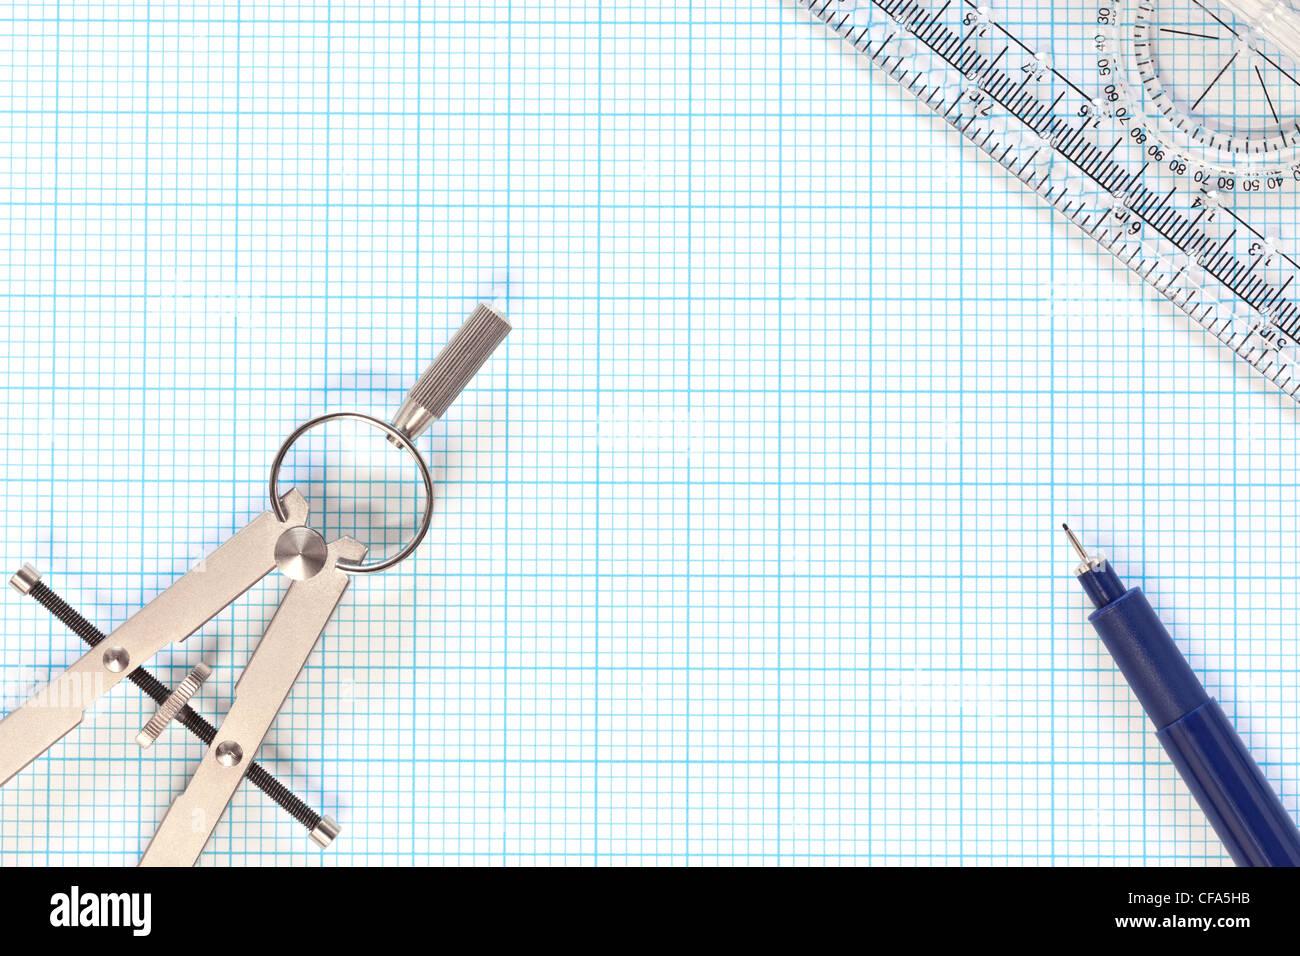 Graph Lines Stockfotos & Graph Lines Bilder - Alamy